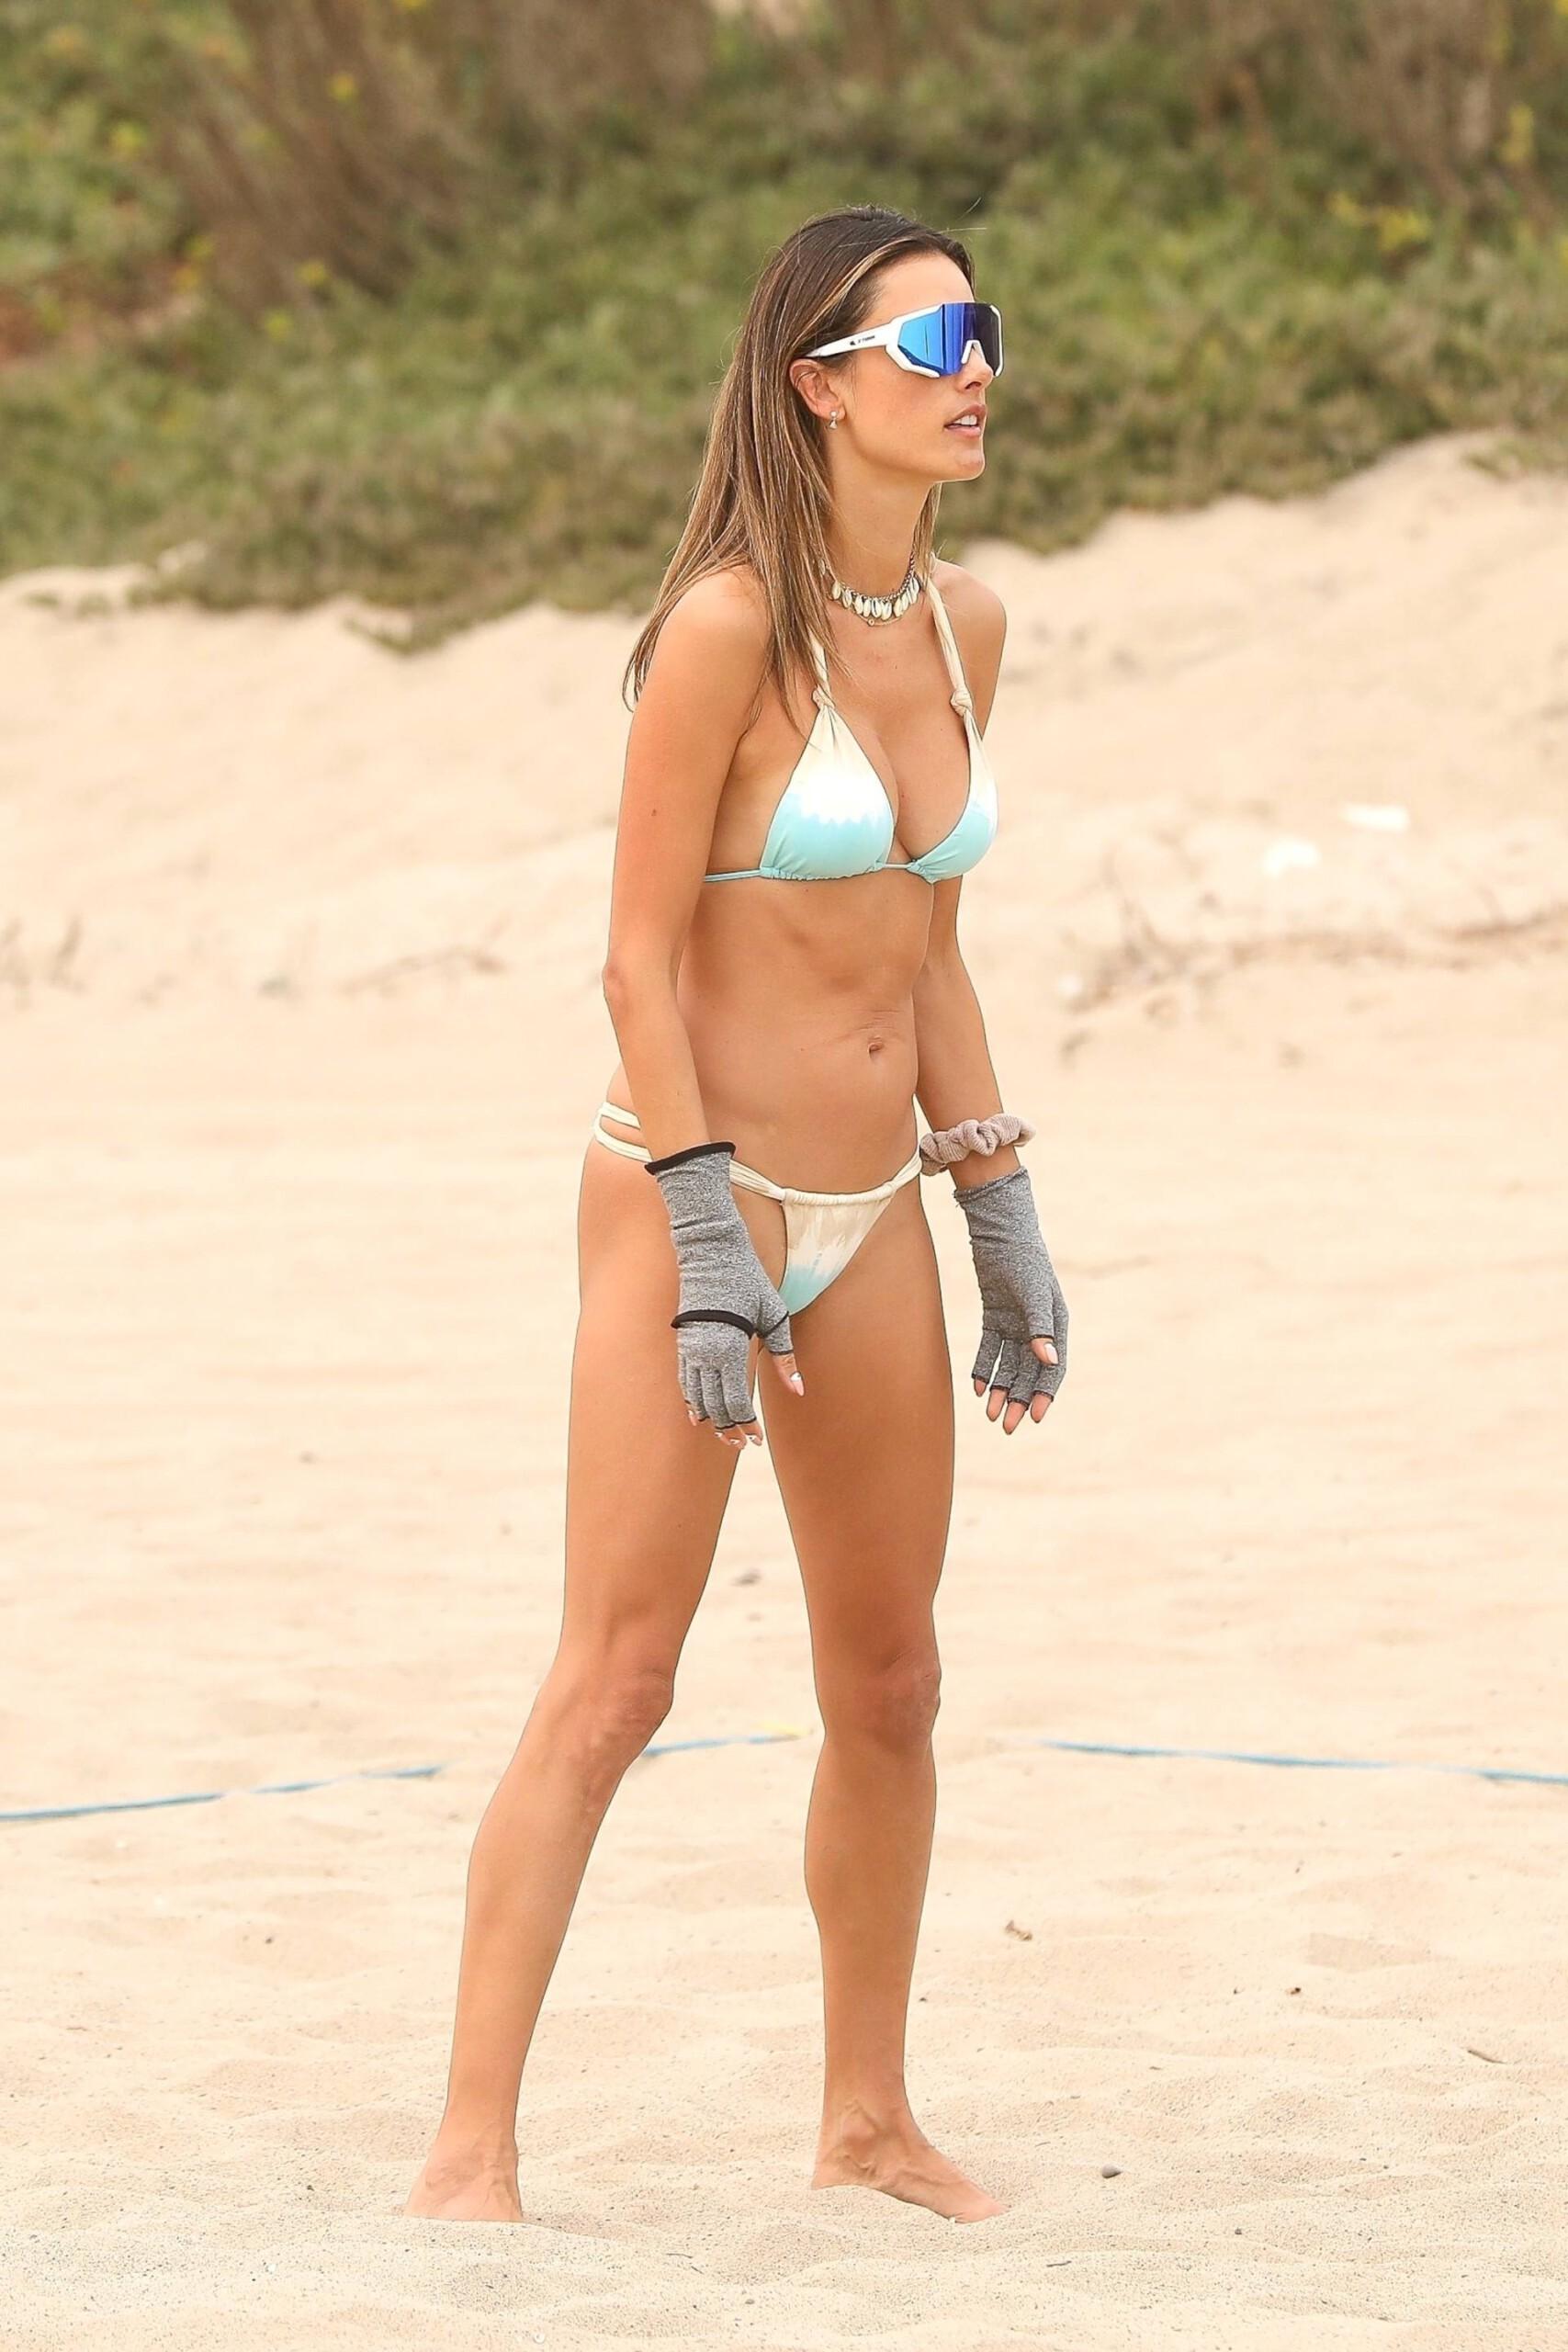 Alessandra Ambrosio - Hot Body in Small BIkini on the Beach in Malibu